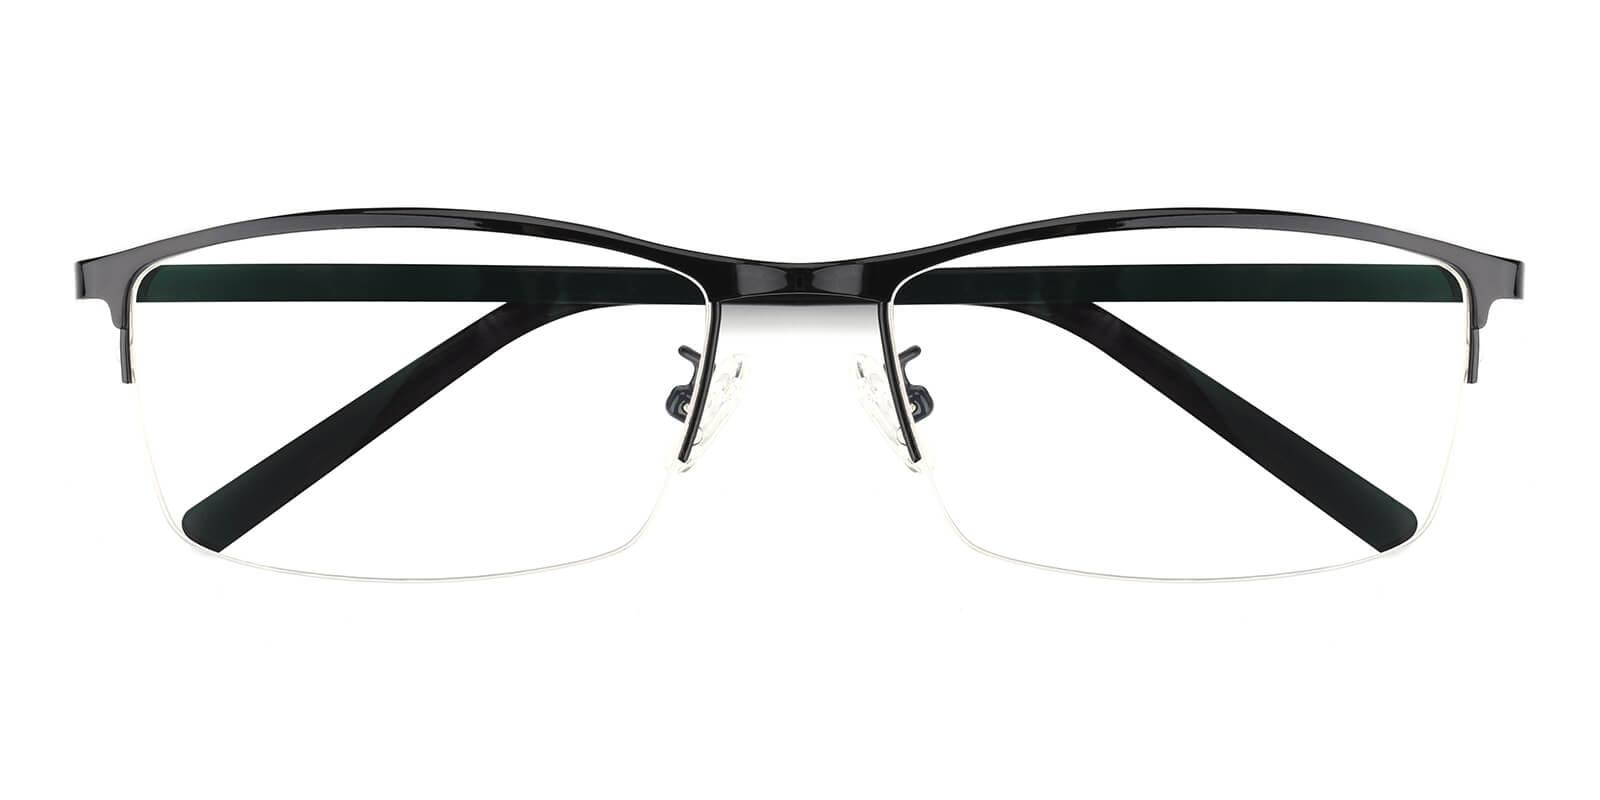 Elegant-Black-Rectangle-Metal-Eyeglasses-detail